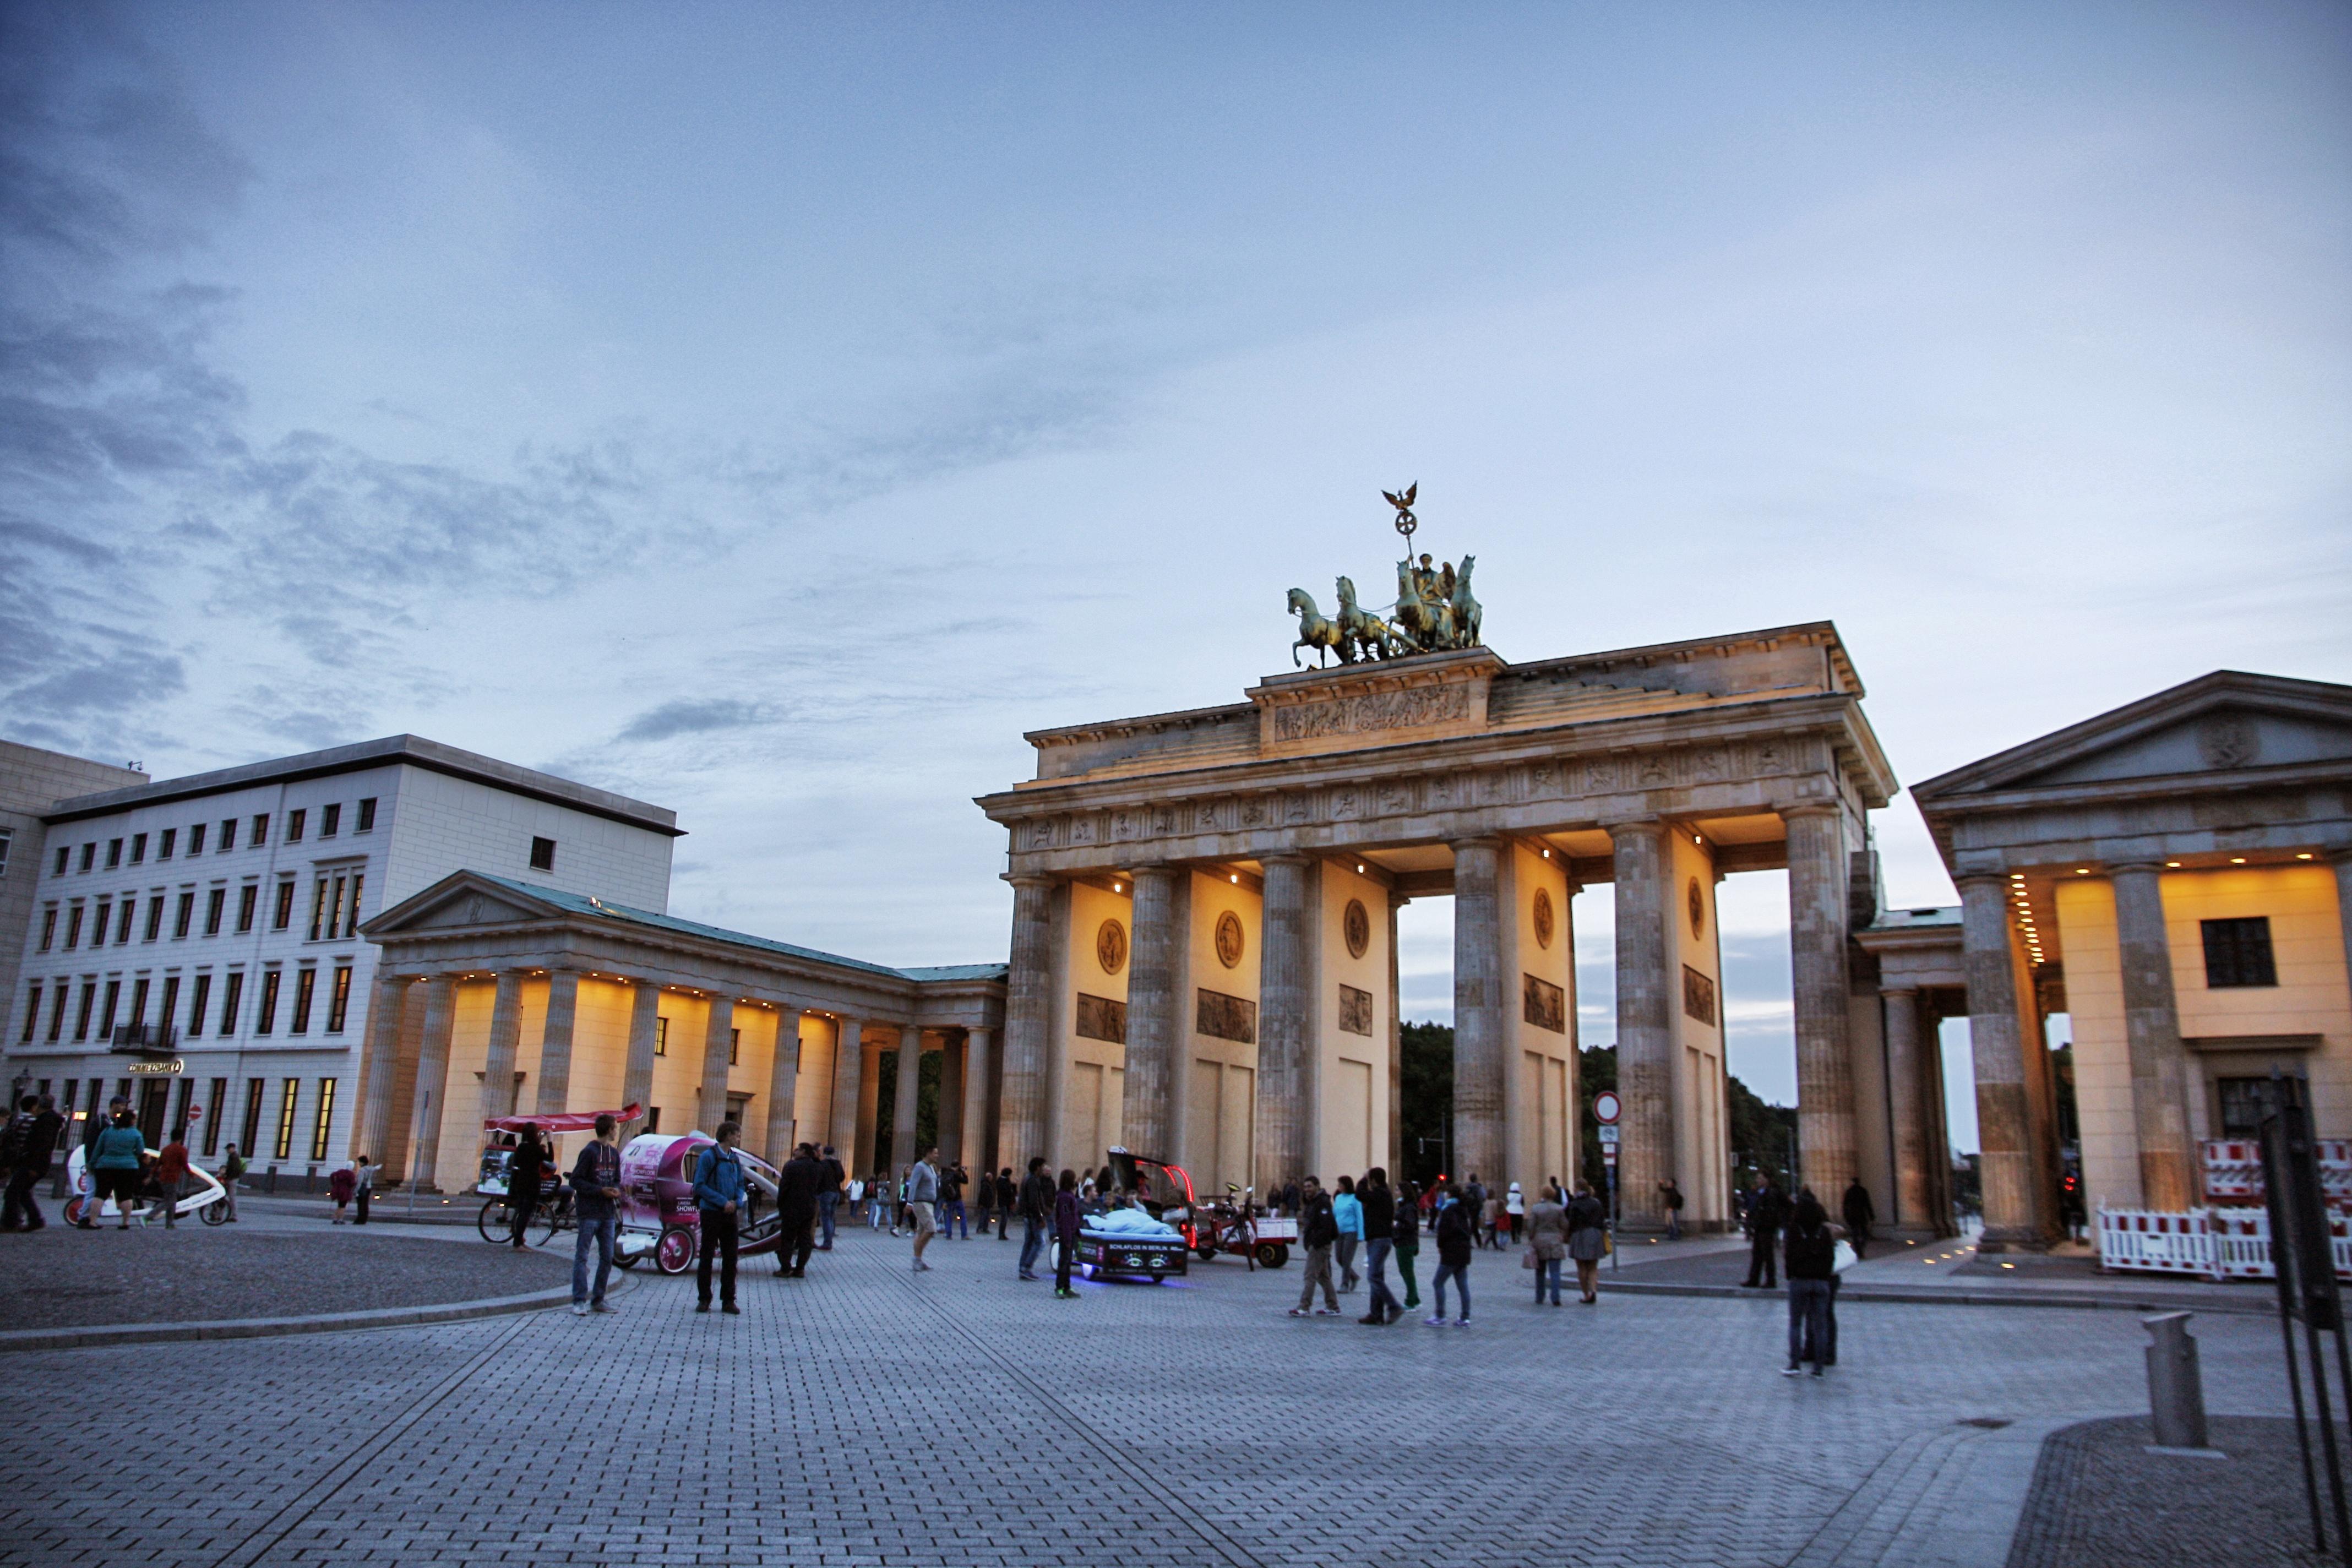 10 motivi per andare a Berlino - One Life in Travel c4d3b8745f92